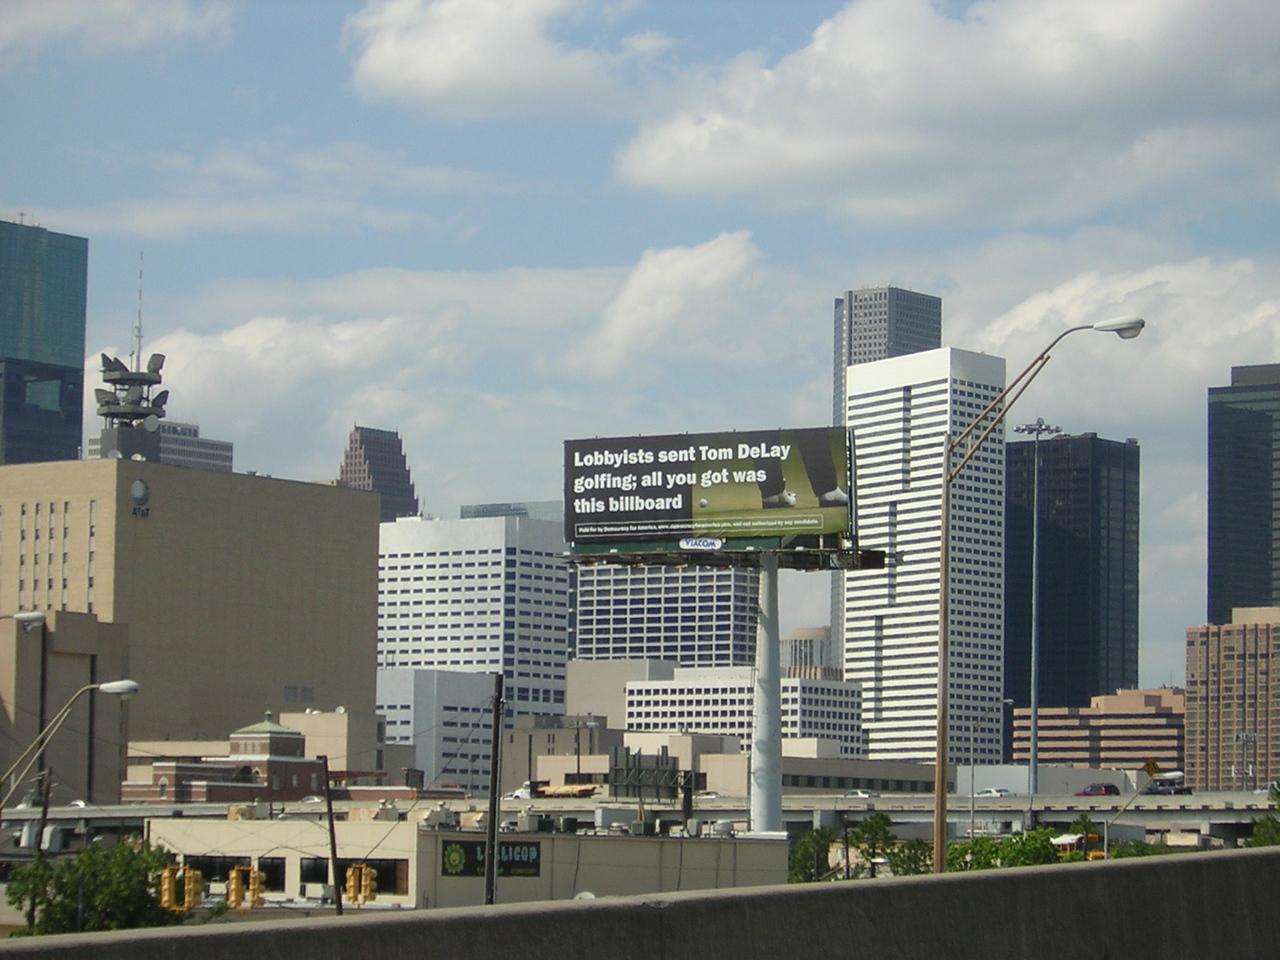 Tom Delay billboard off 610 in Houston